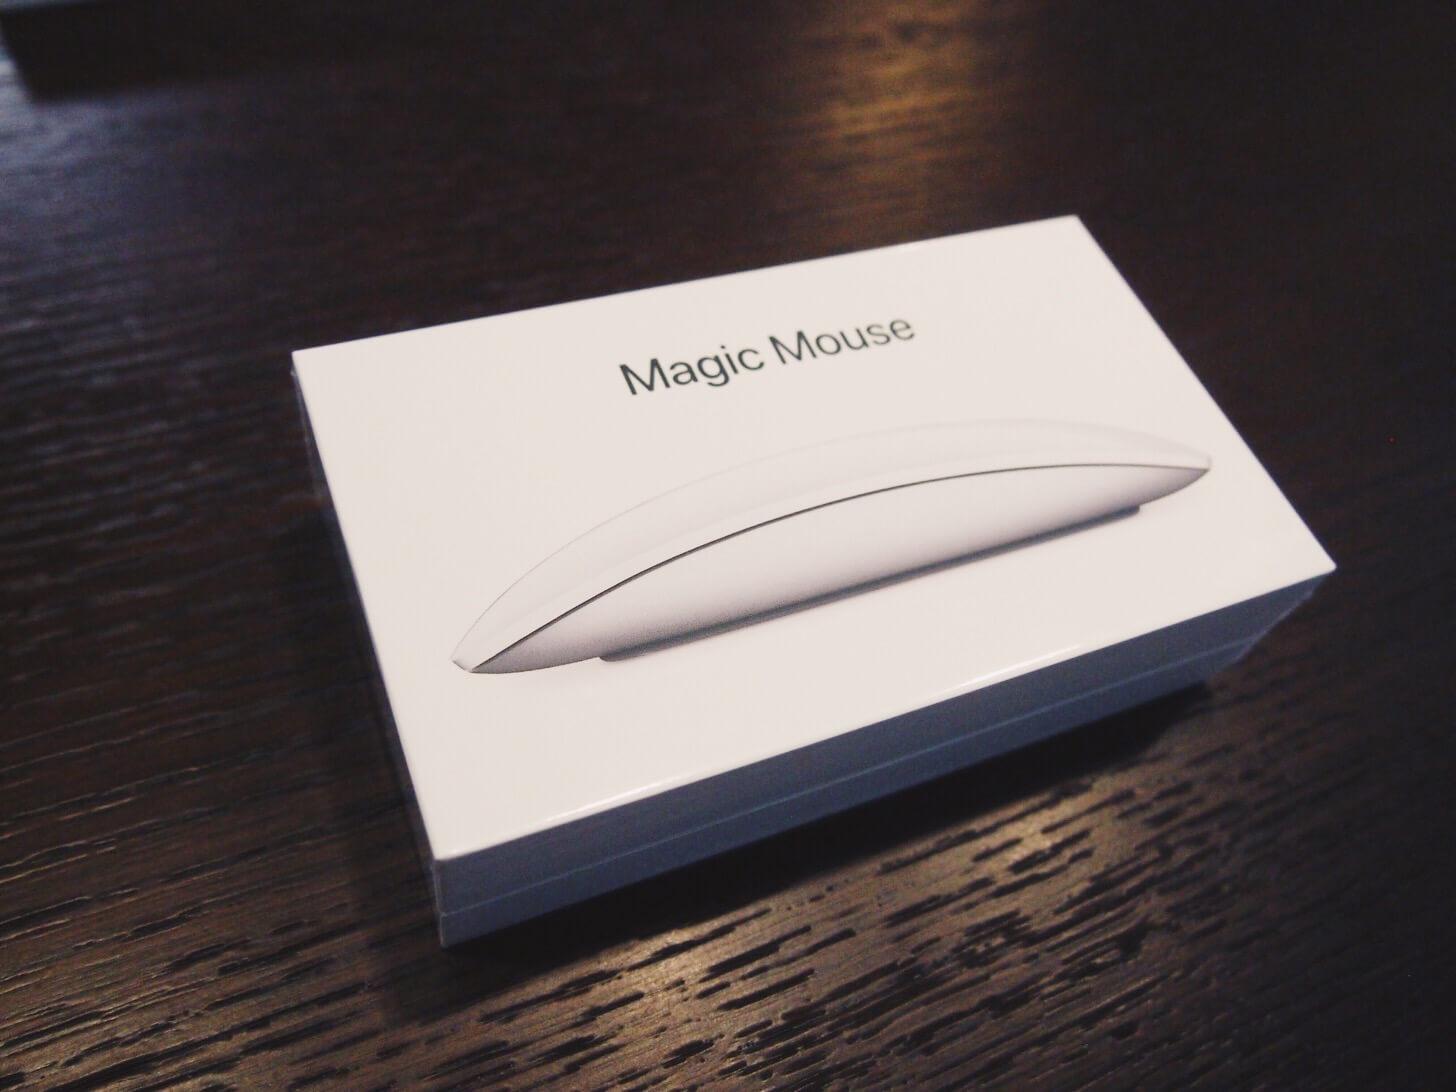 macbookpro2016-15inch-4